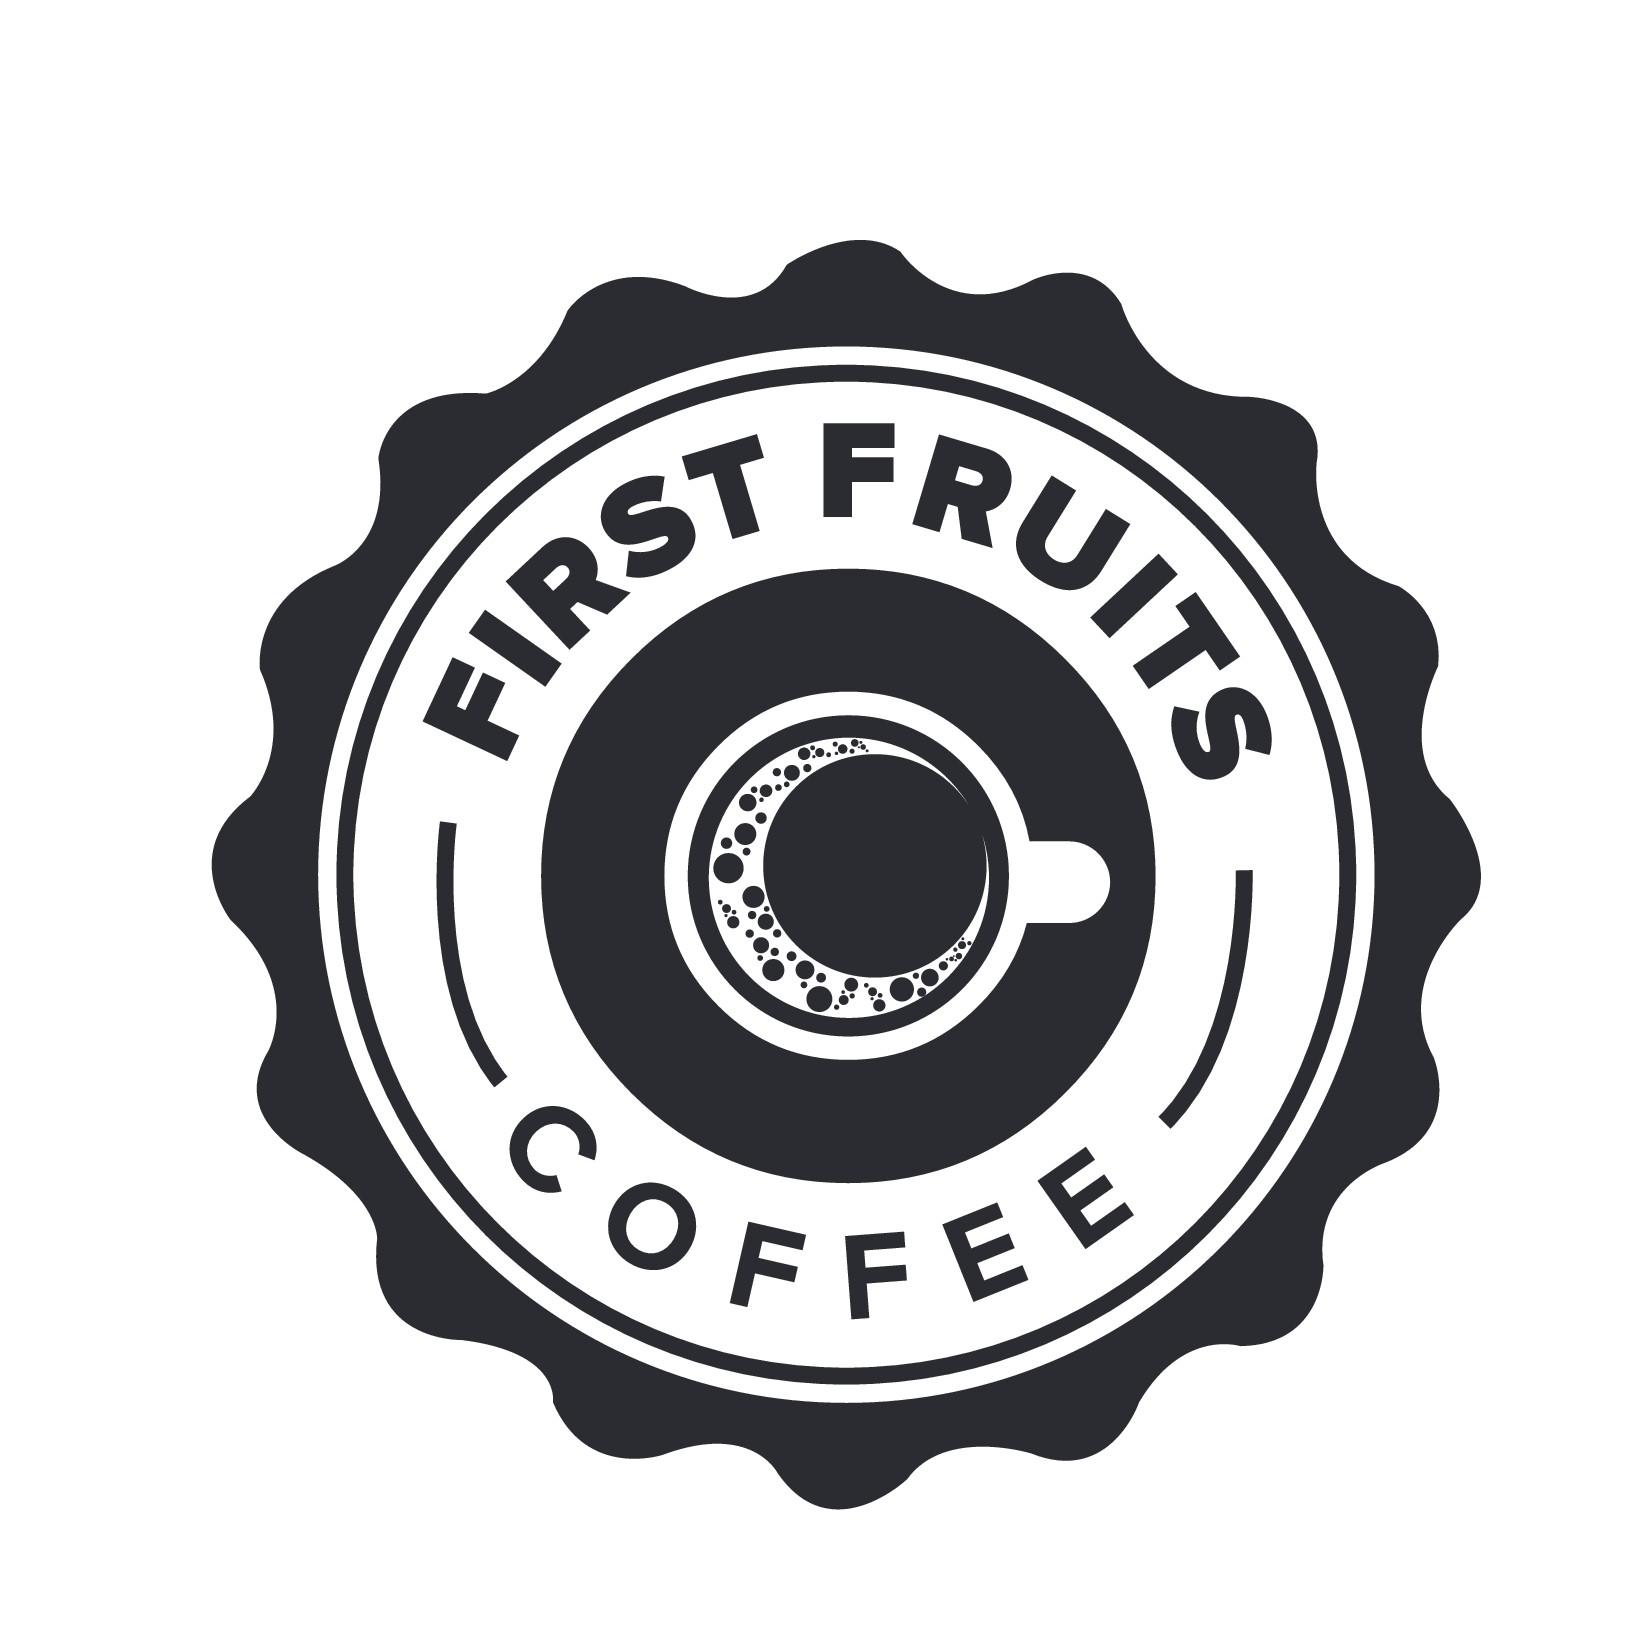 Create a logo for an upstart coffee company.